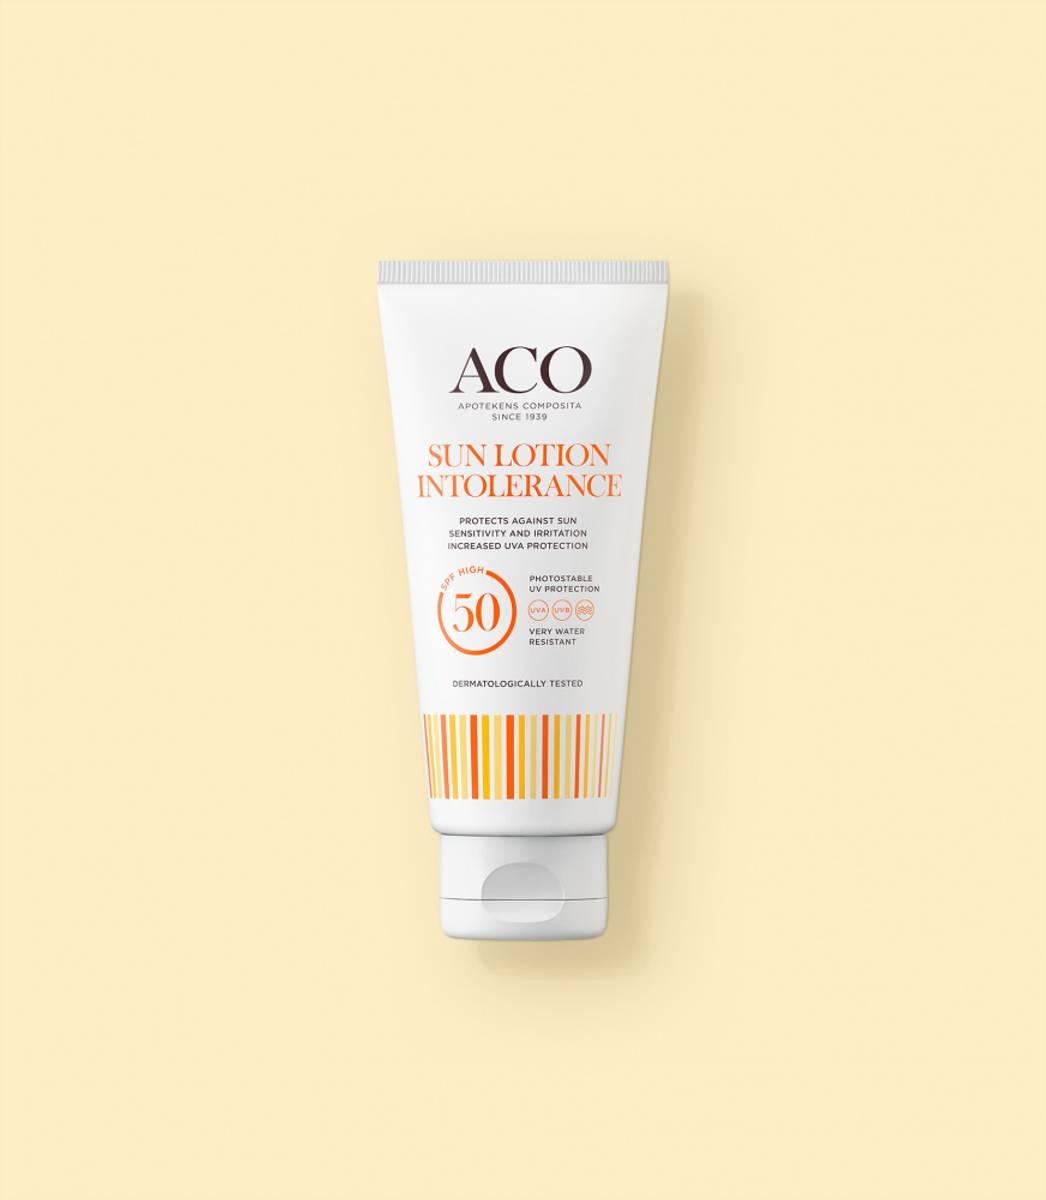 Aco intolerance sunlotion f50 u/p 100 ml